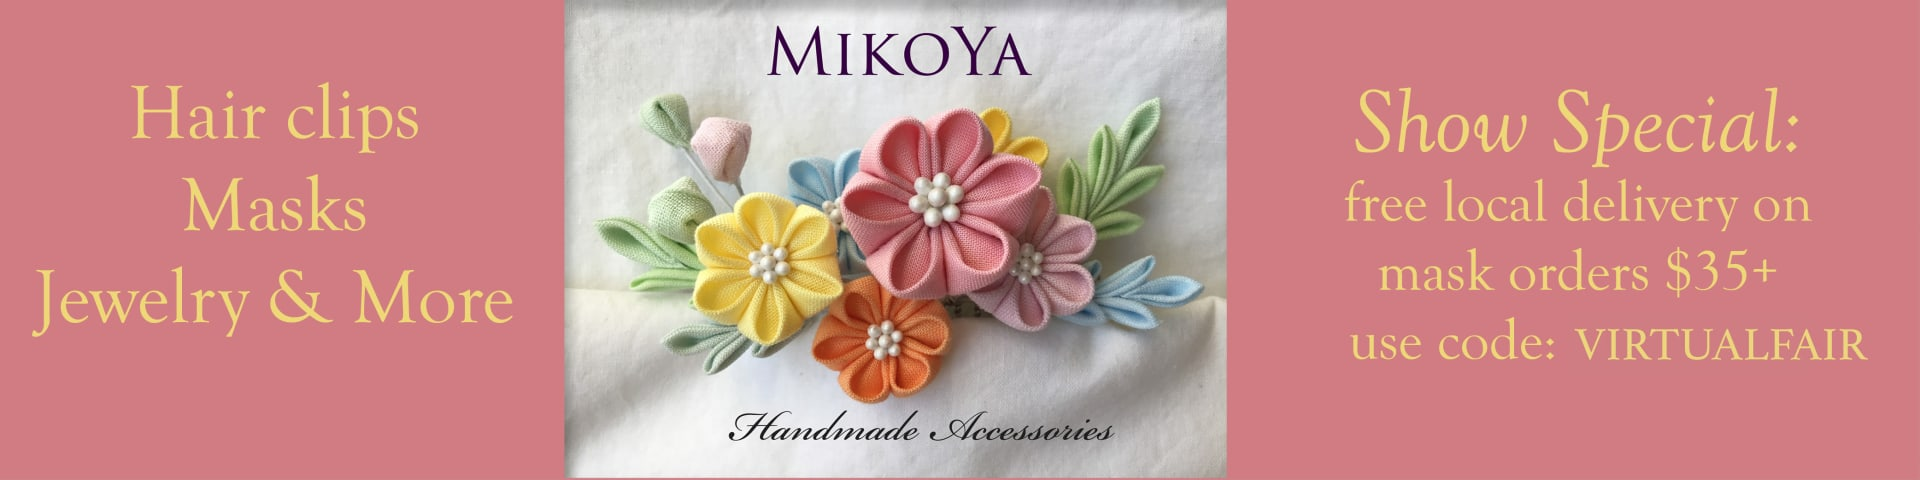 MikoYaBanner-w1920.jpg